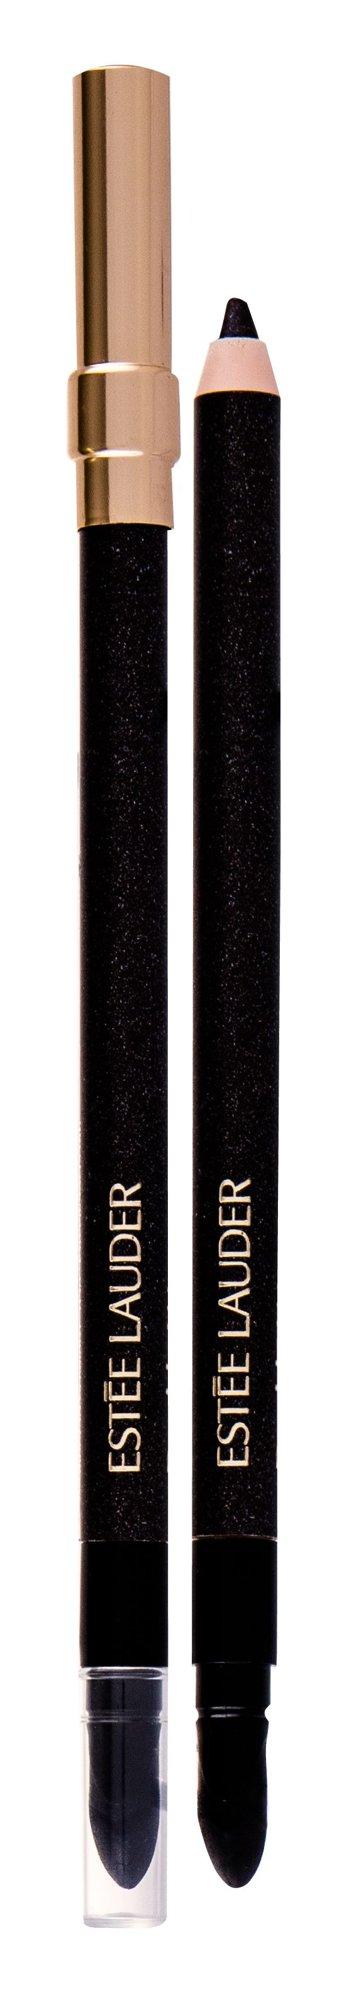 Estée Lauder Double Wear Eye Pencil 1,2ml 01 Onyx